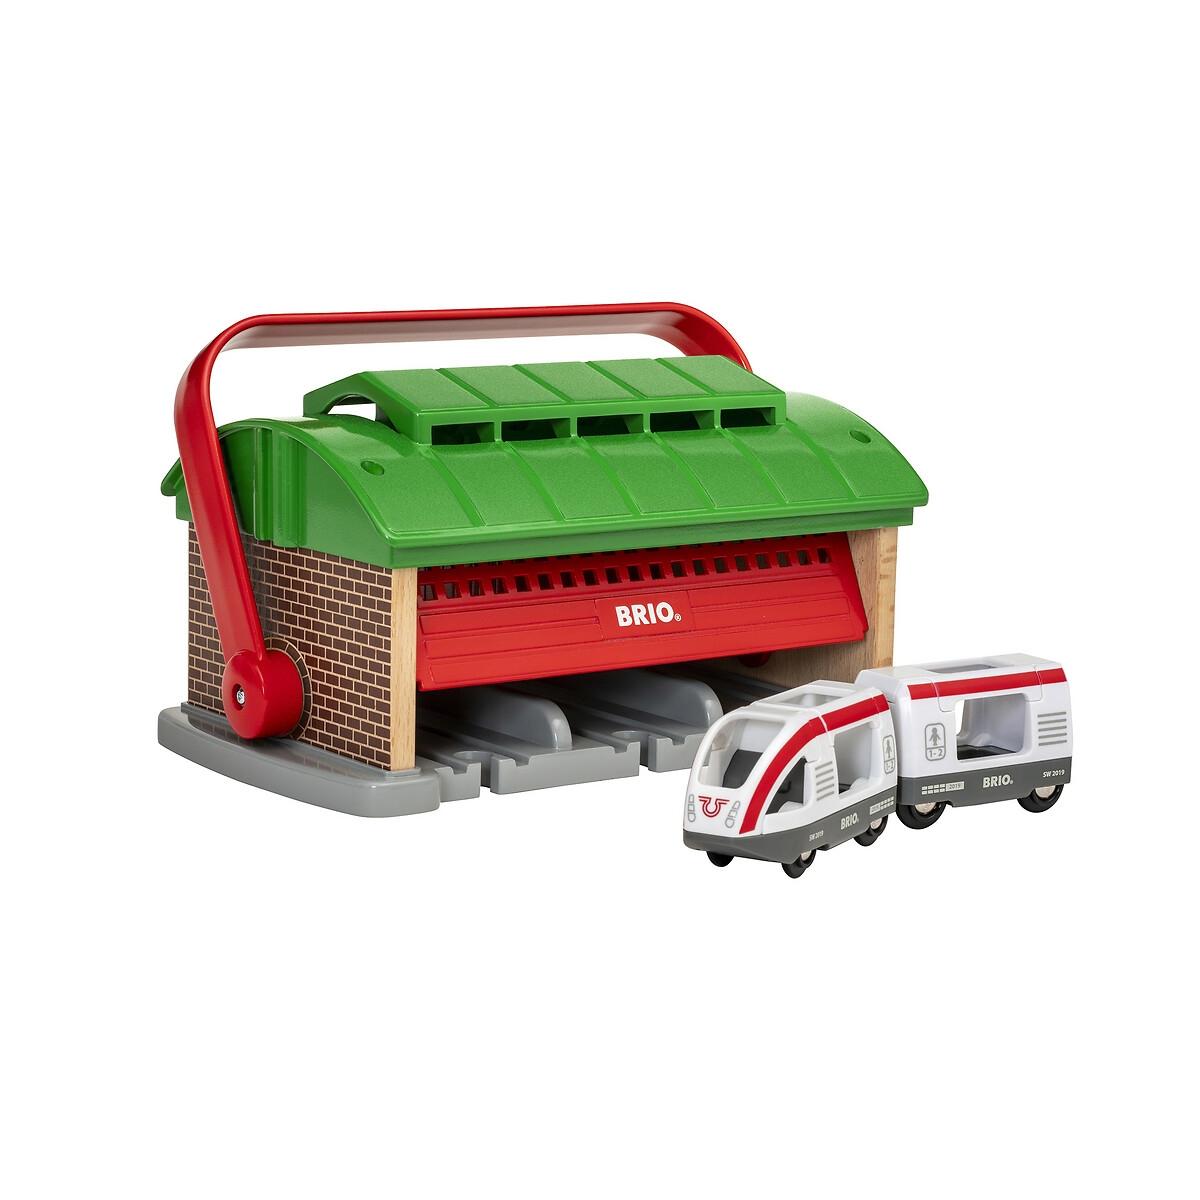 An image of Brio Portable Train Garage